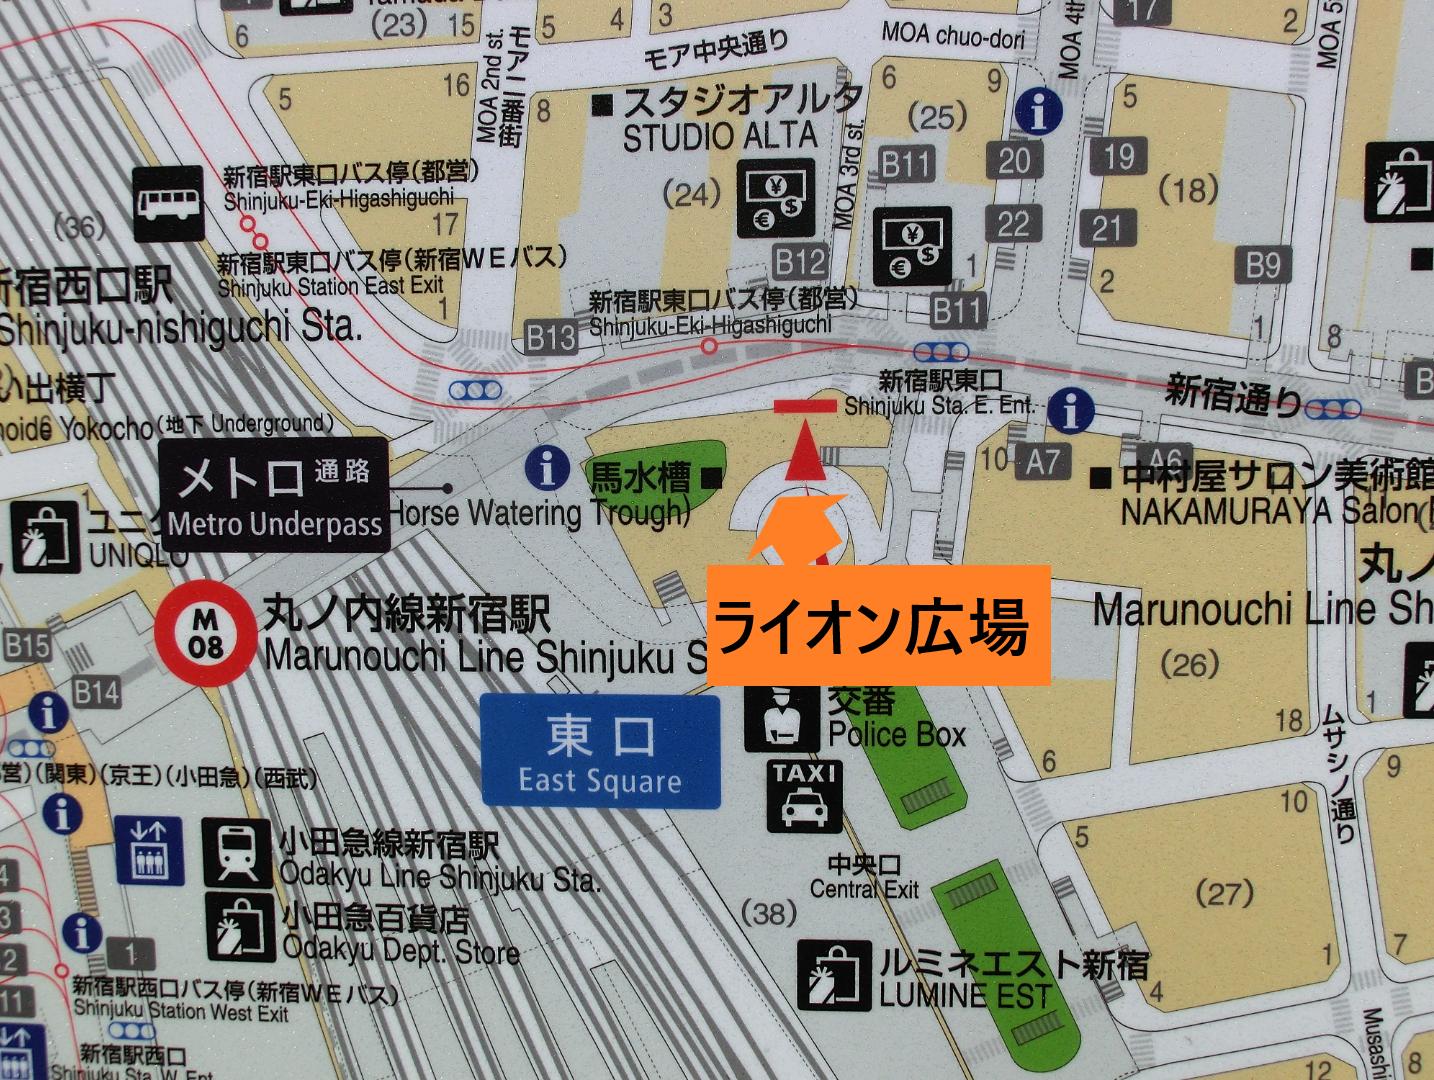 ライオン広場地図 新宿駅東口記事1